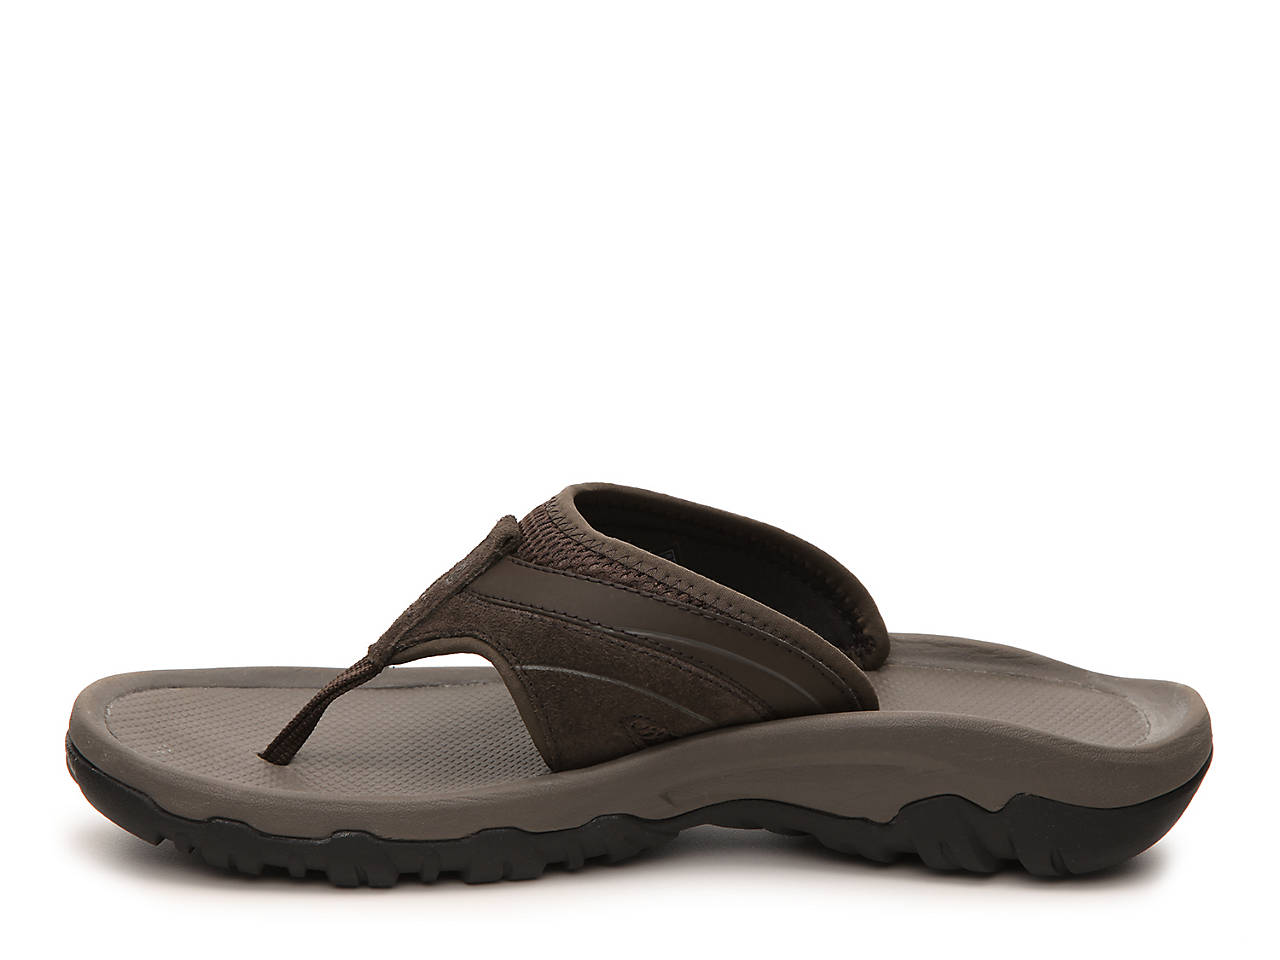 895220ba9c36 Teva Pajaro Sandal Men s Shoes